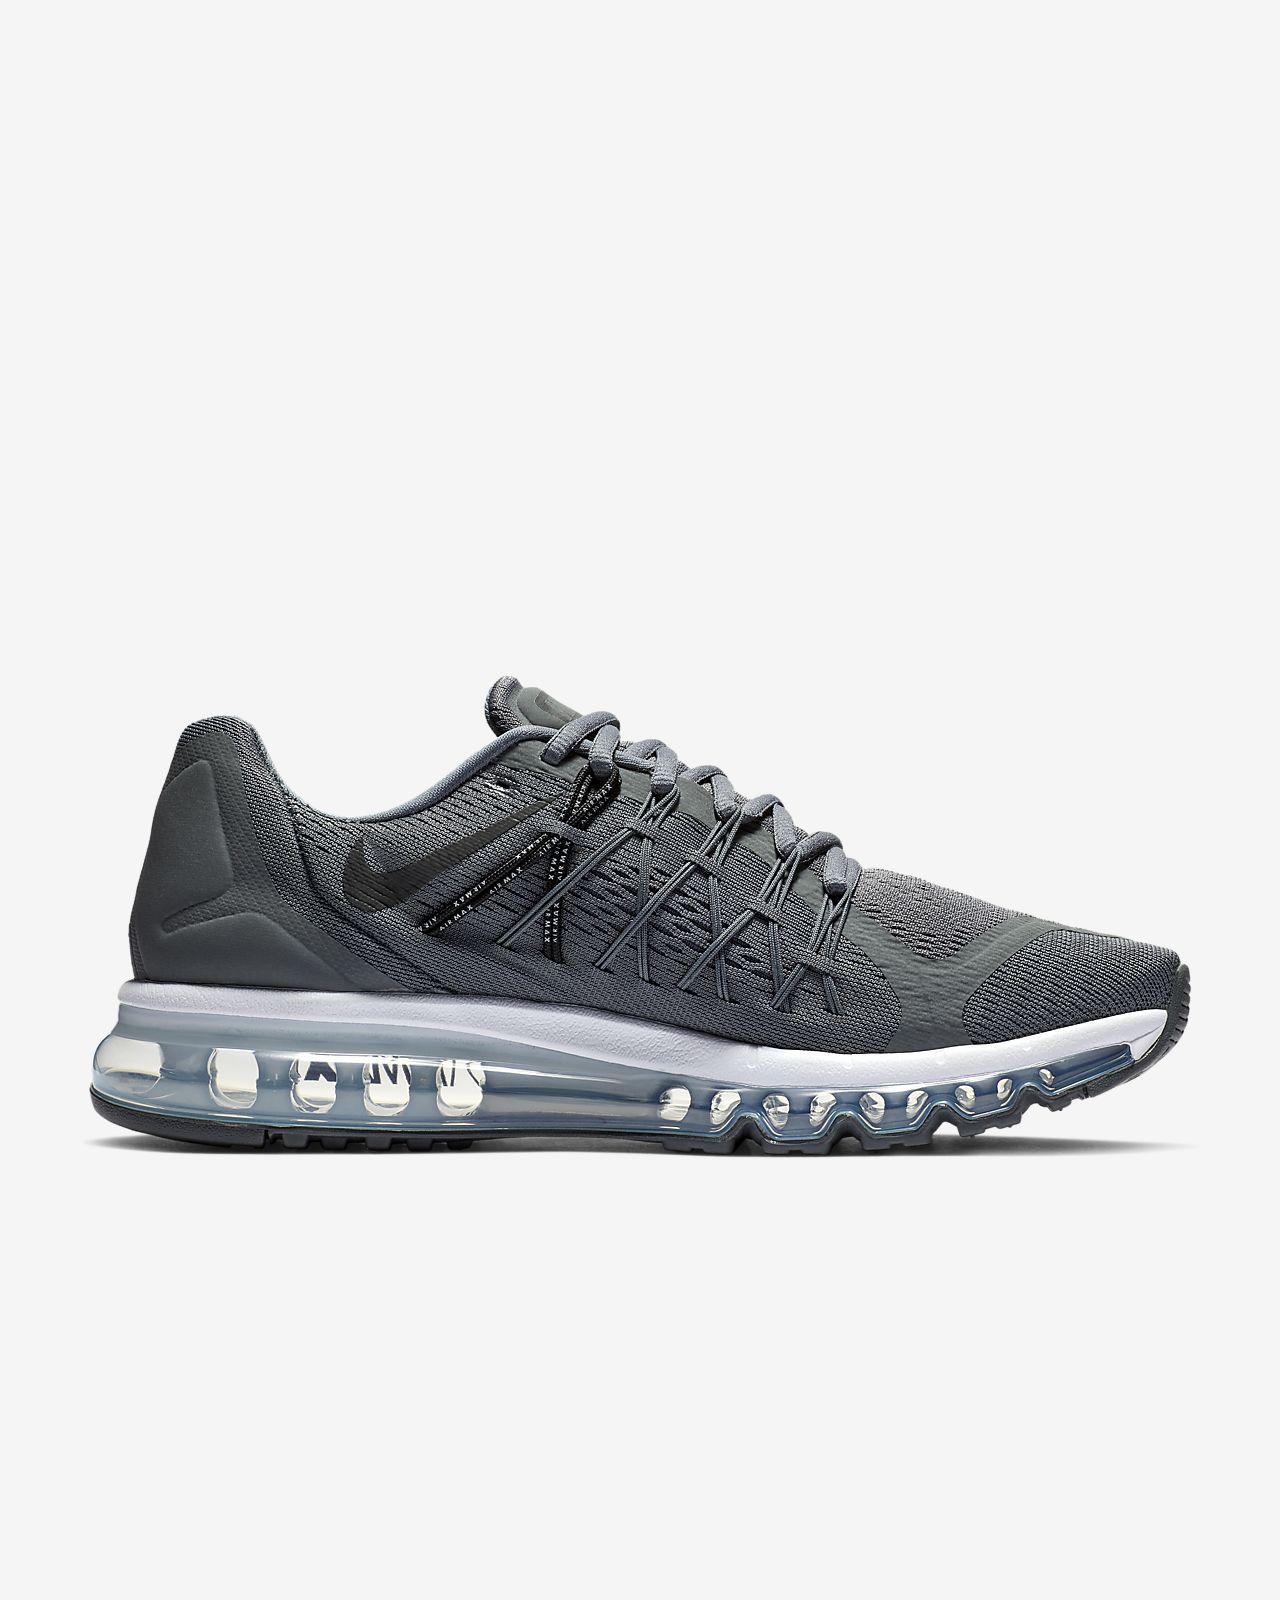 buy popular 6565a 5ebf6 ... Nike Air Max 2015 Men s Shoe